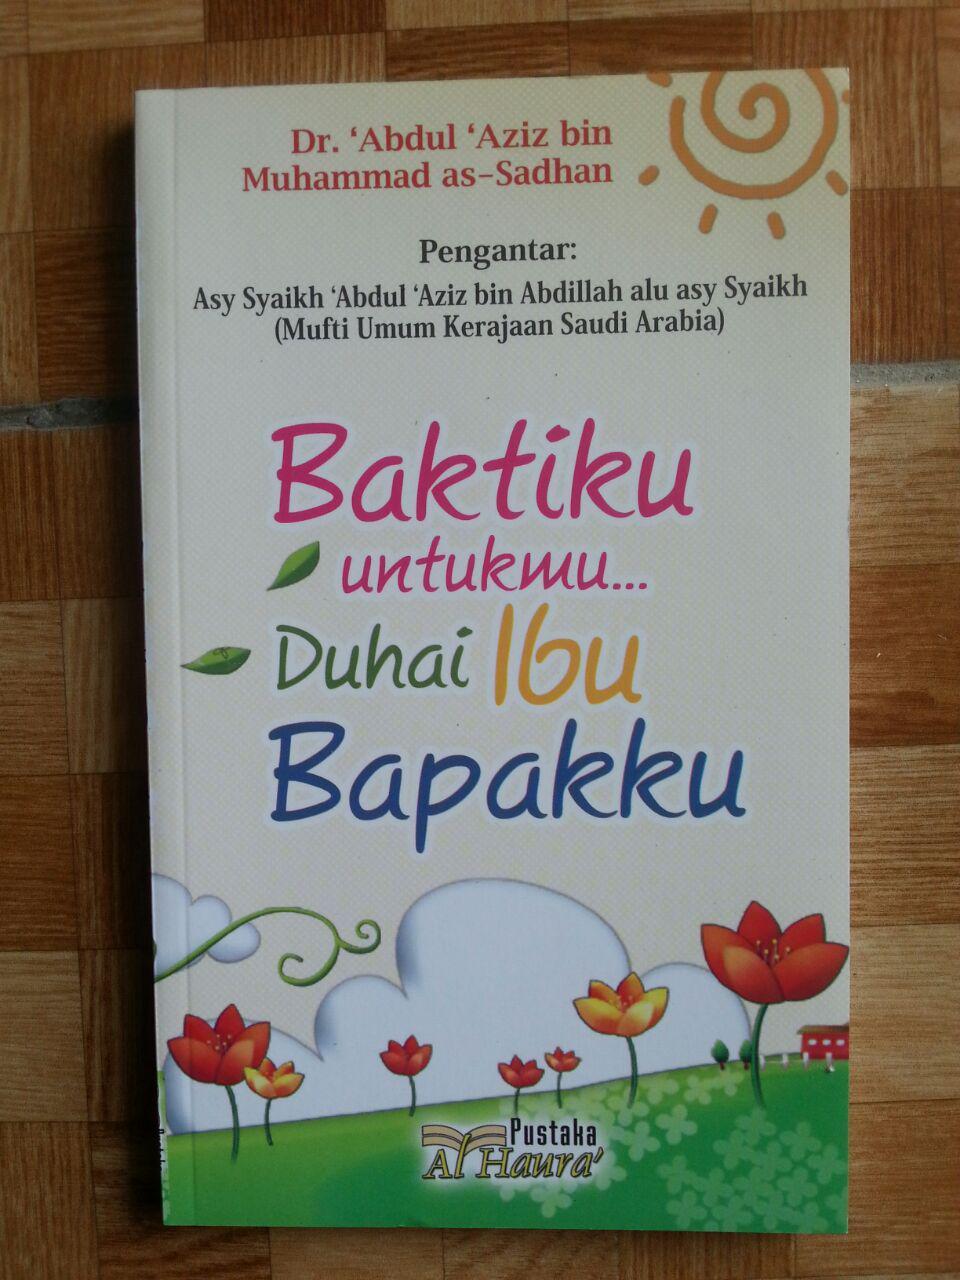 Buku Baktiku Untukmu… Duhai Ibu Bapakku cover 2